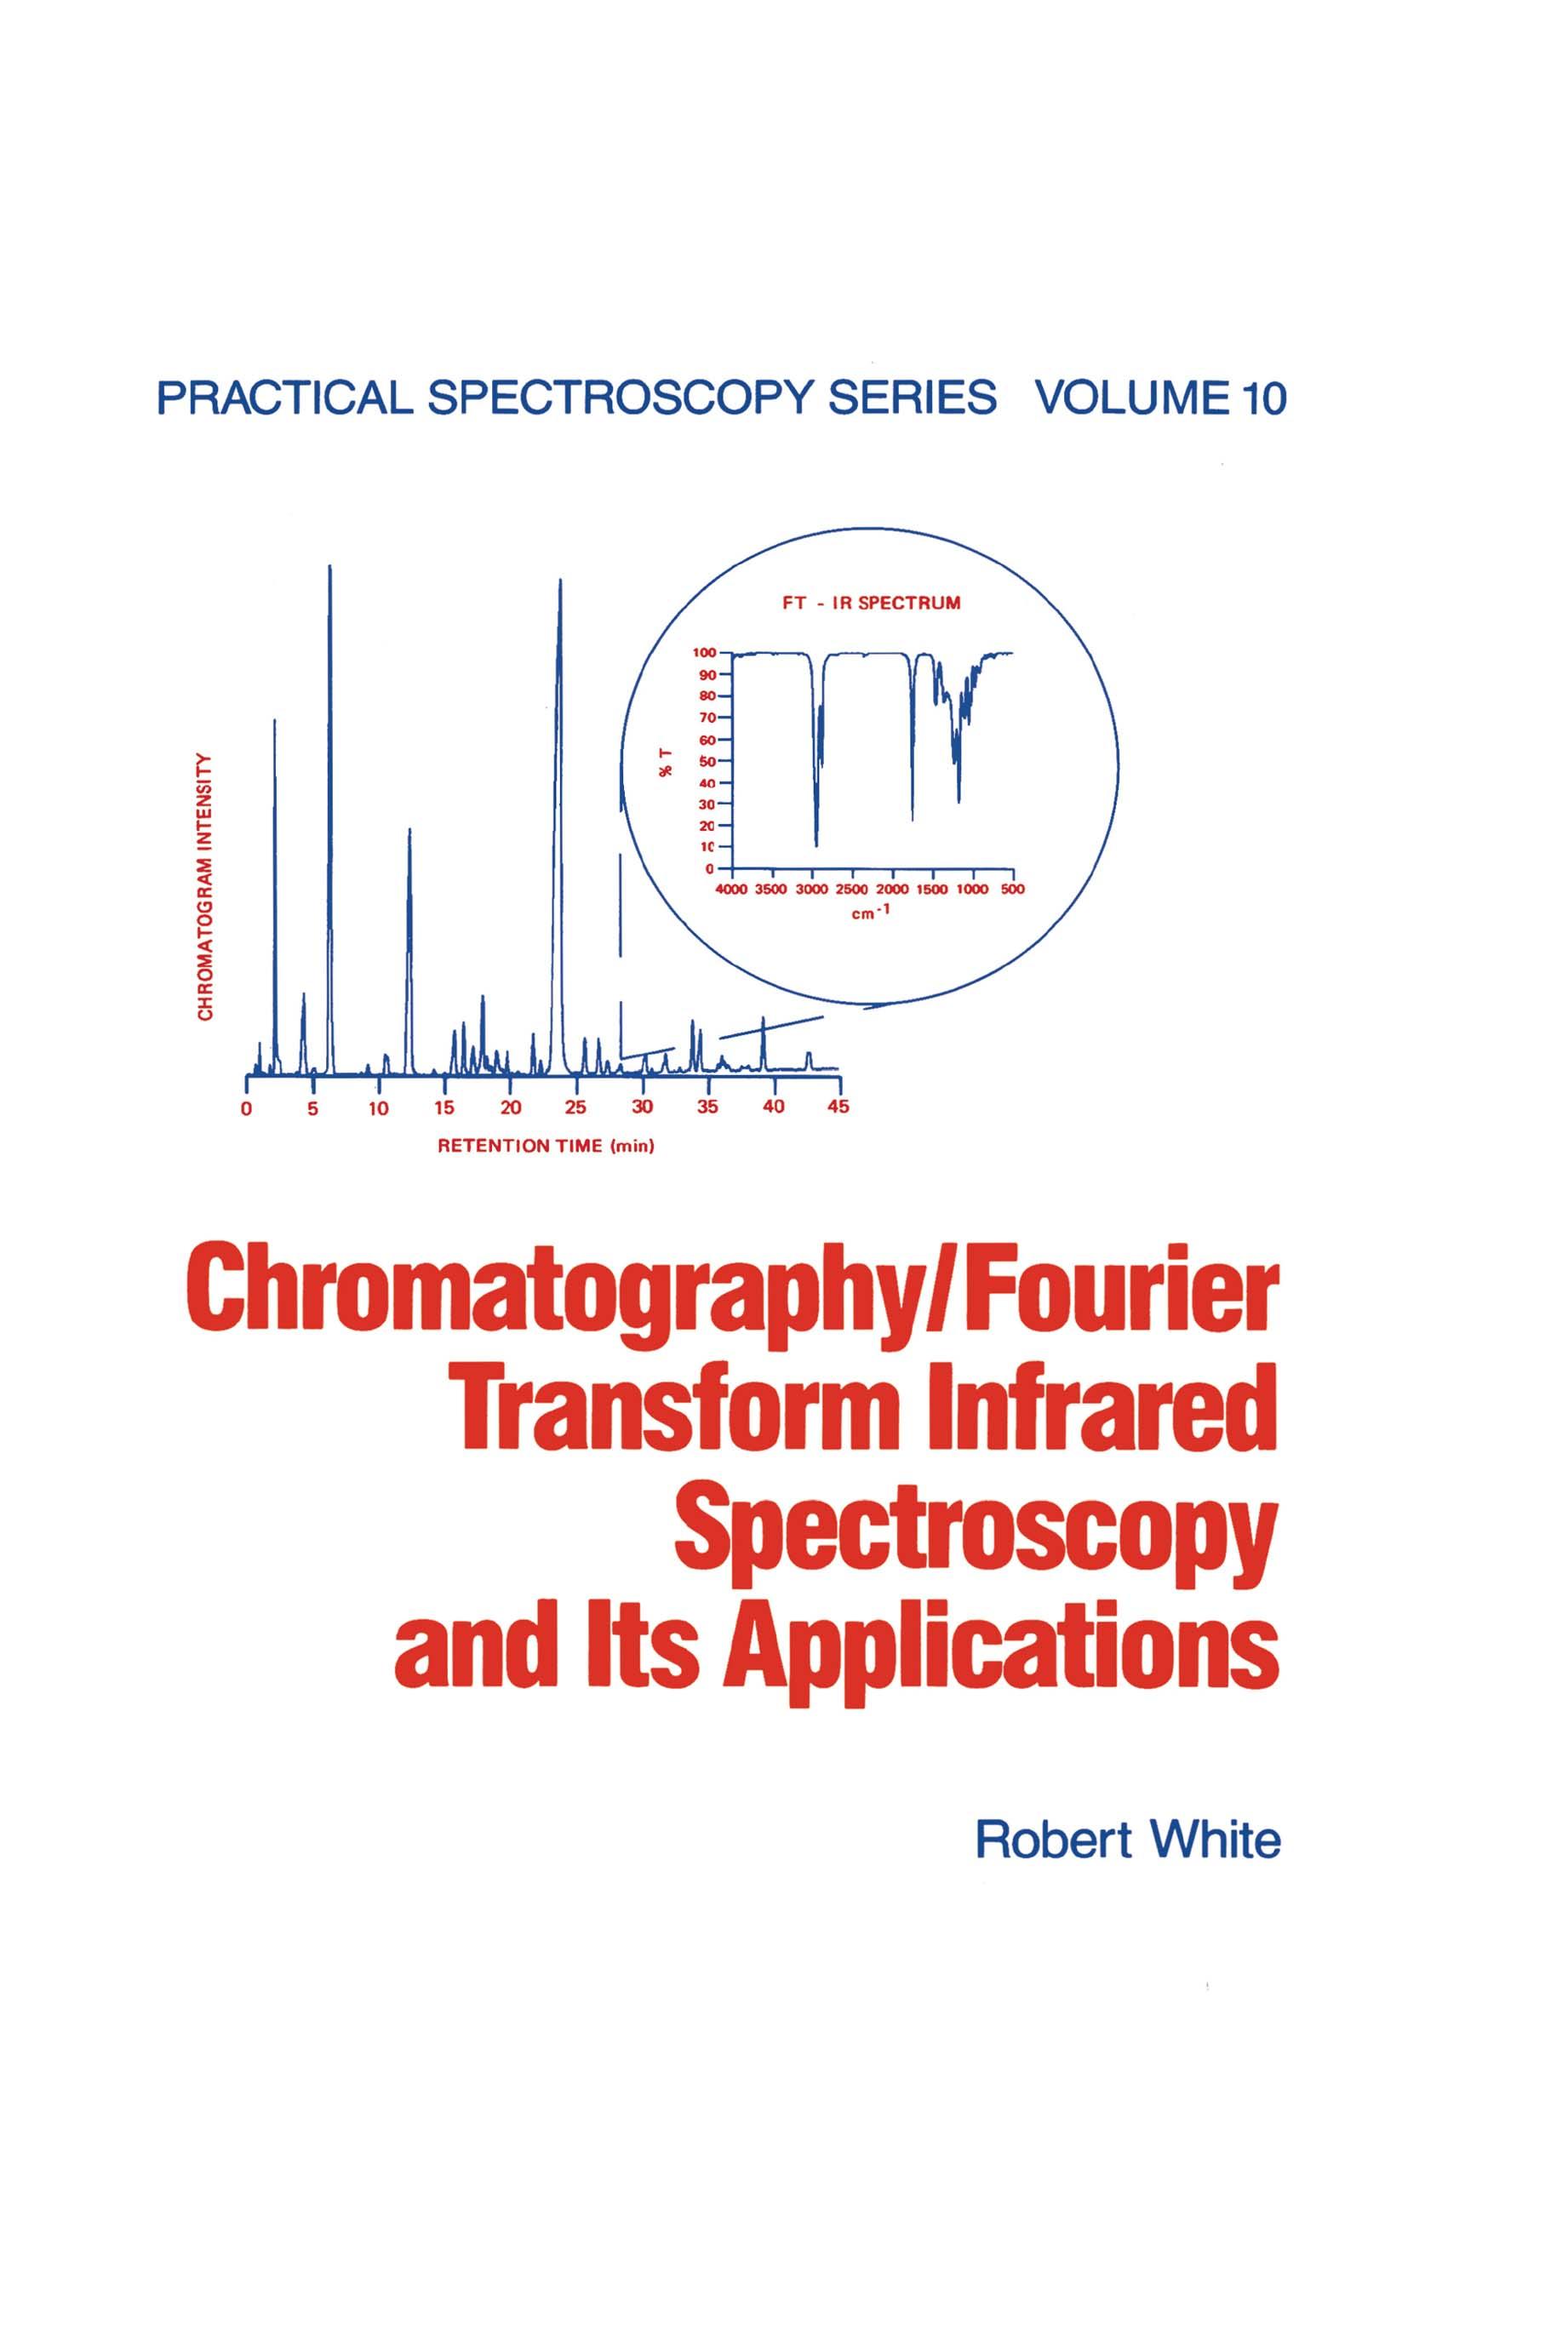 Gas-Liquid Chromatography/Fourier Transform Infrared Spectroscopy